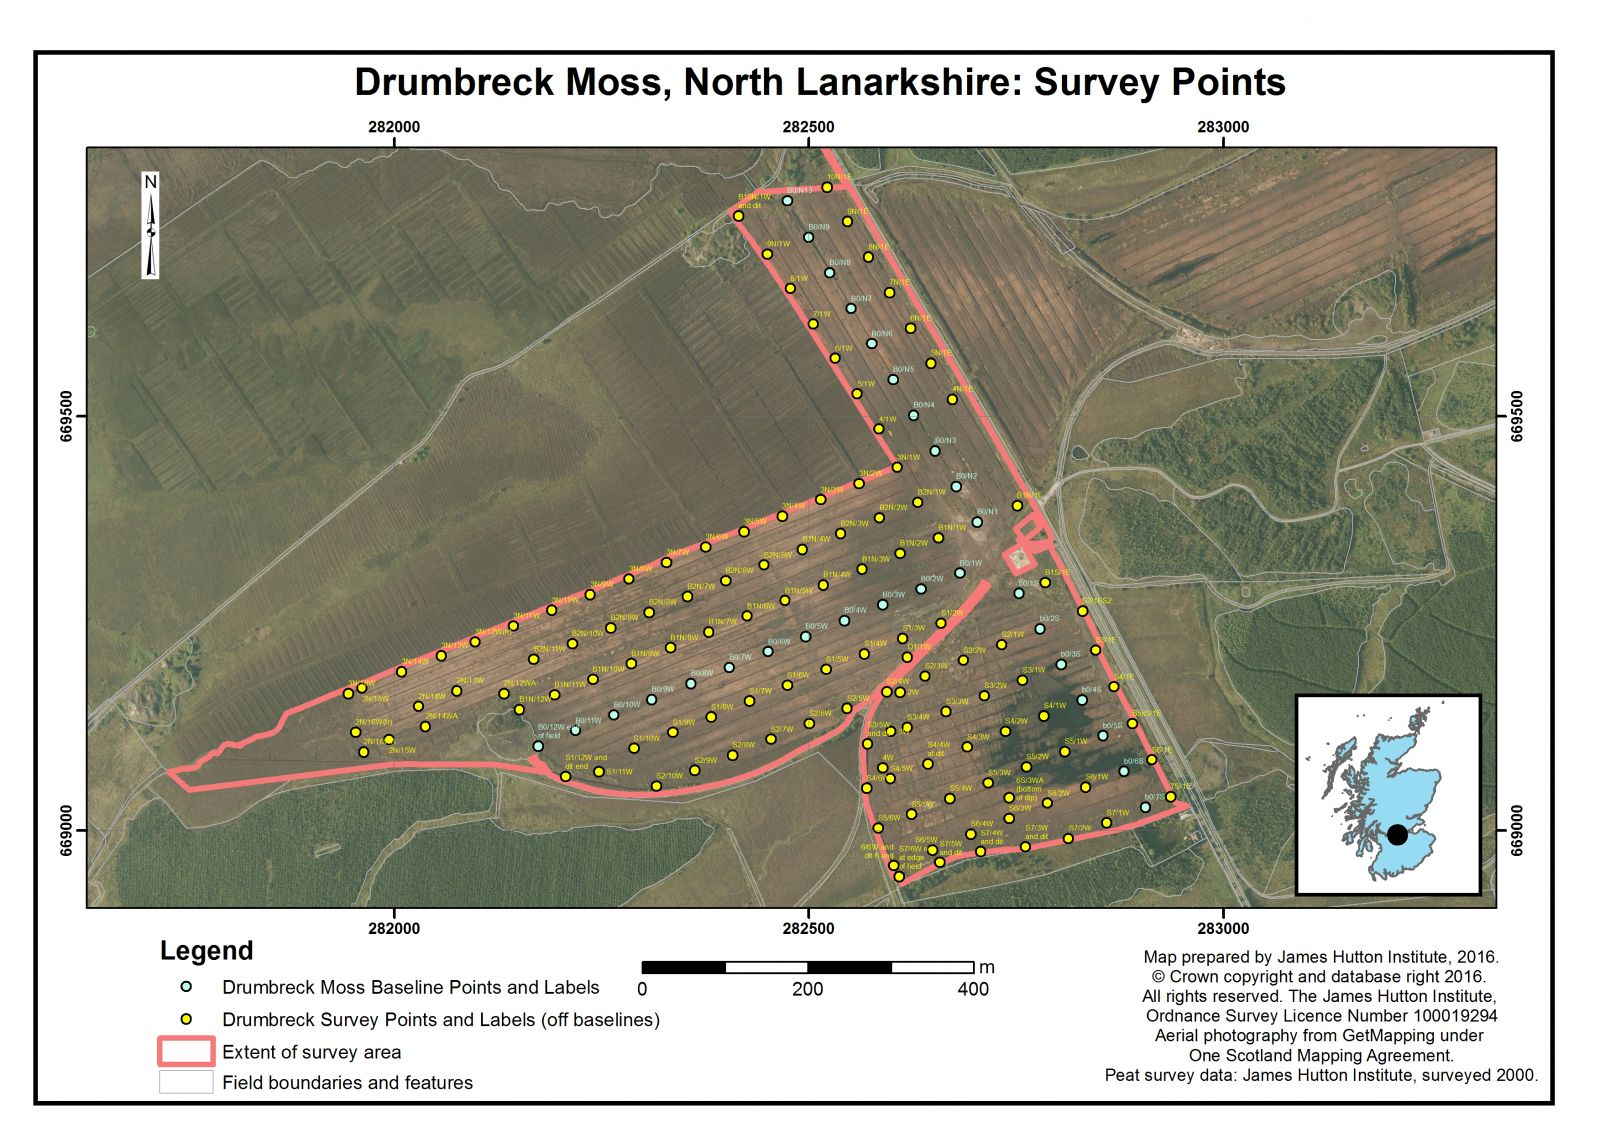 Peat Surveys Drumbreck Moss Natural Resource Datasets The James 282500 North Lanarkshire Survey Points Scottish Sites